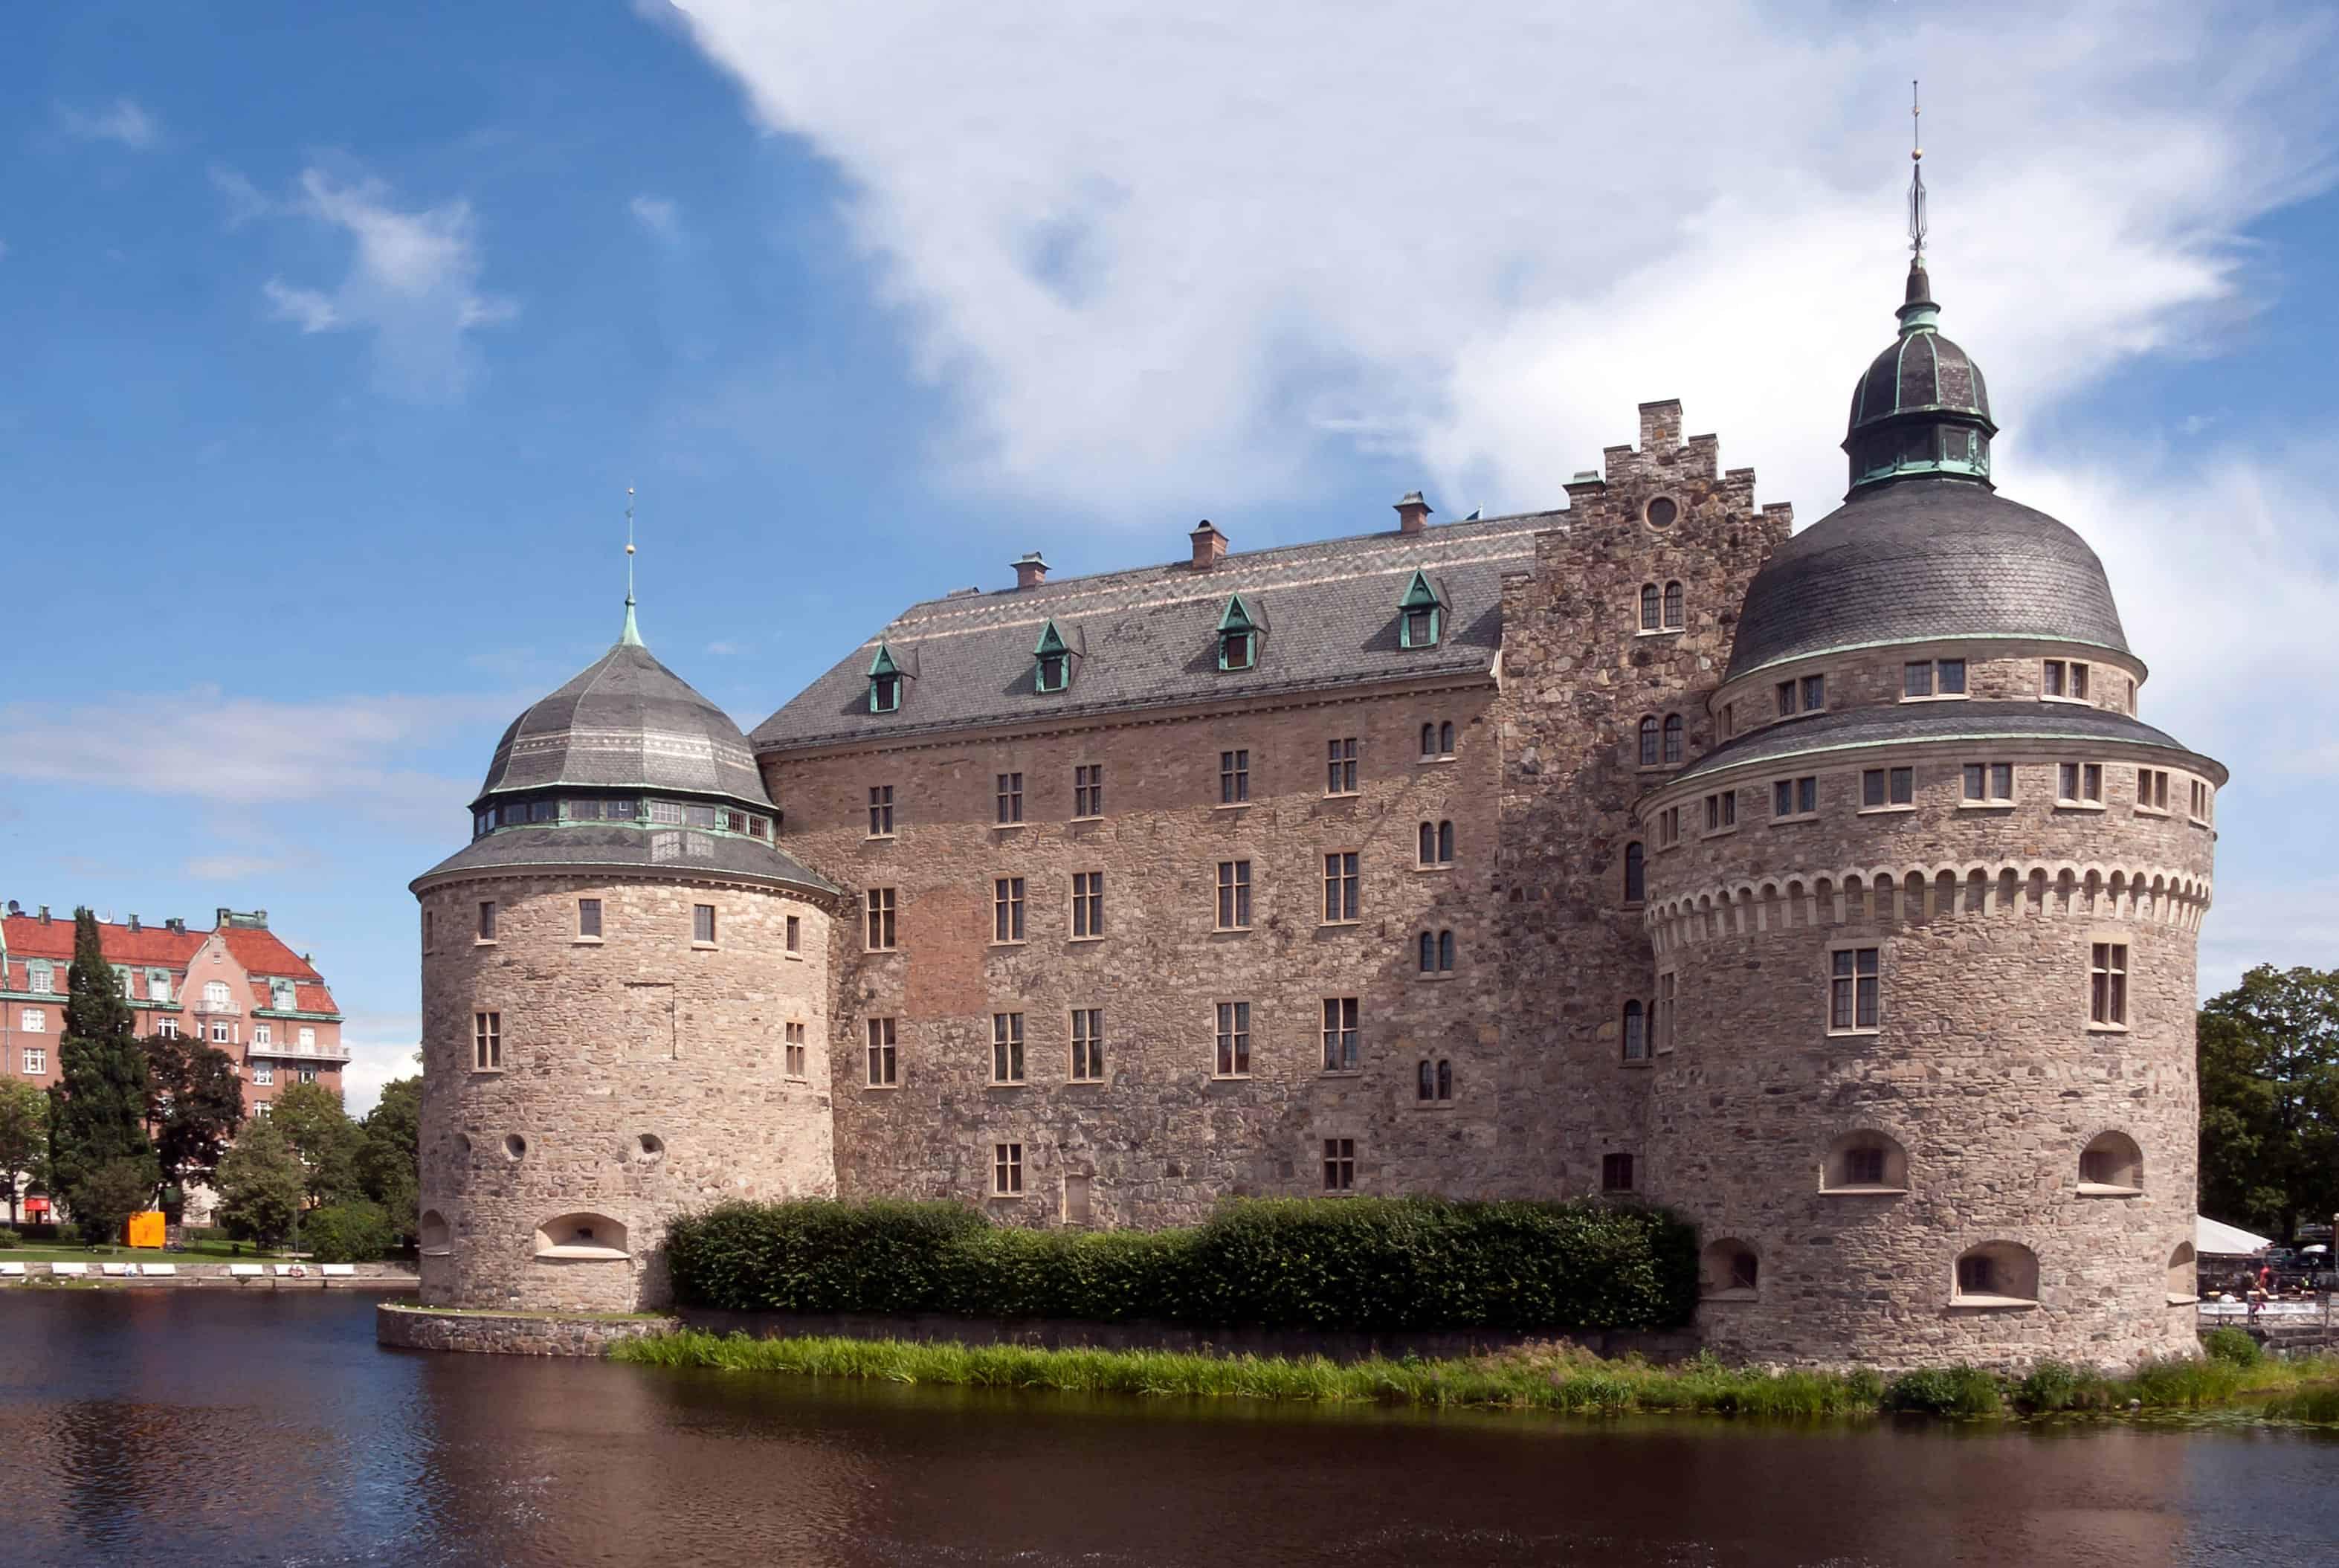 Örebro Castle Sweden